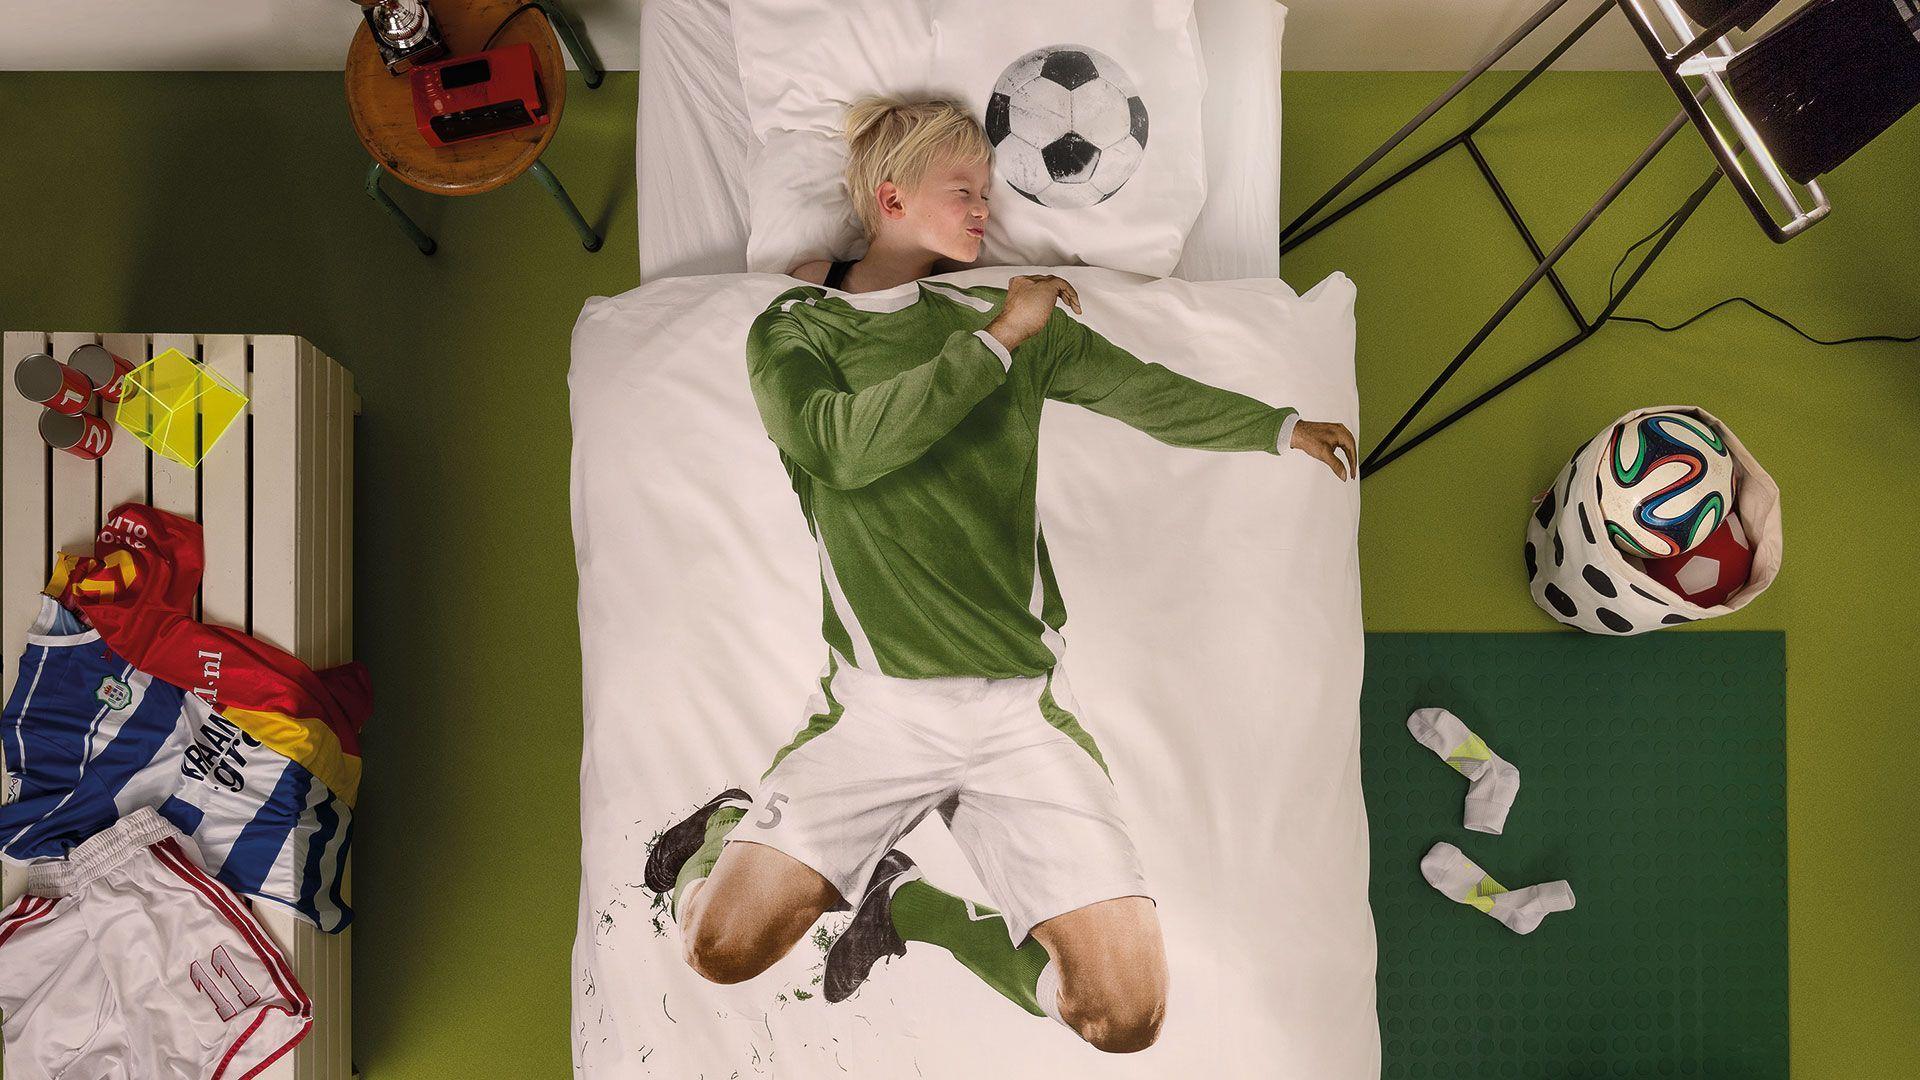 Nieuwe Snurk Soccer Champ dekbedovertrek